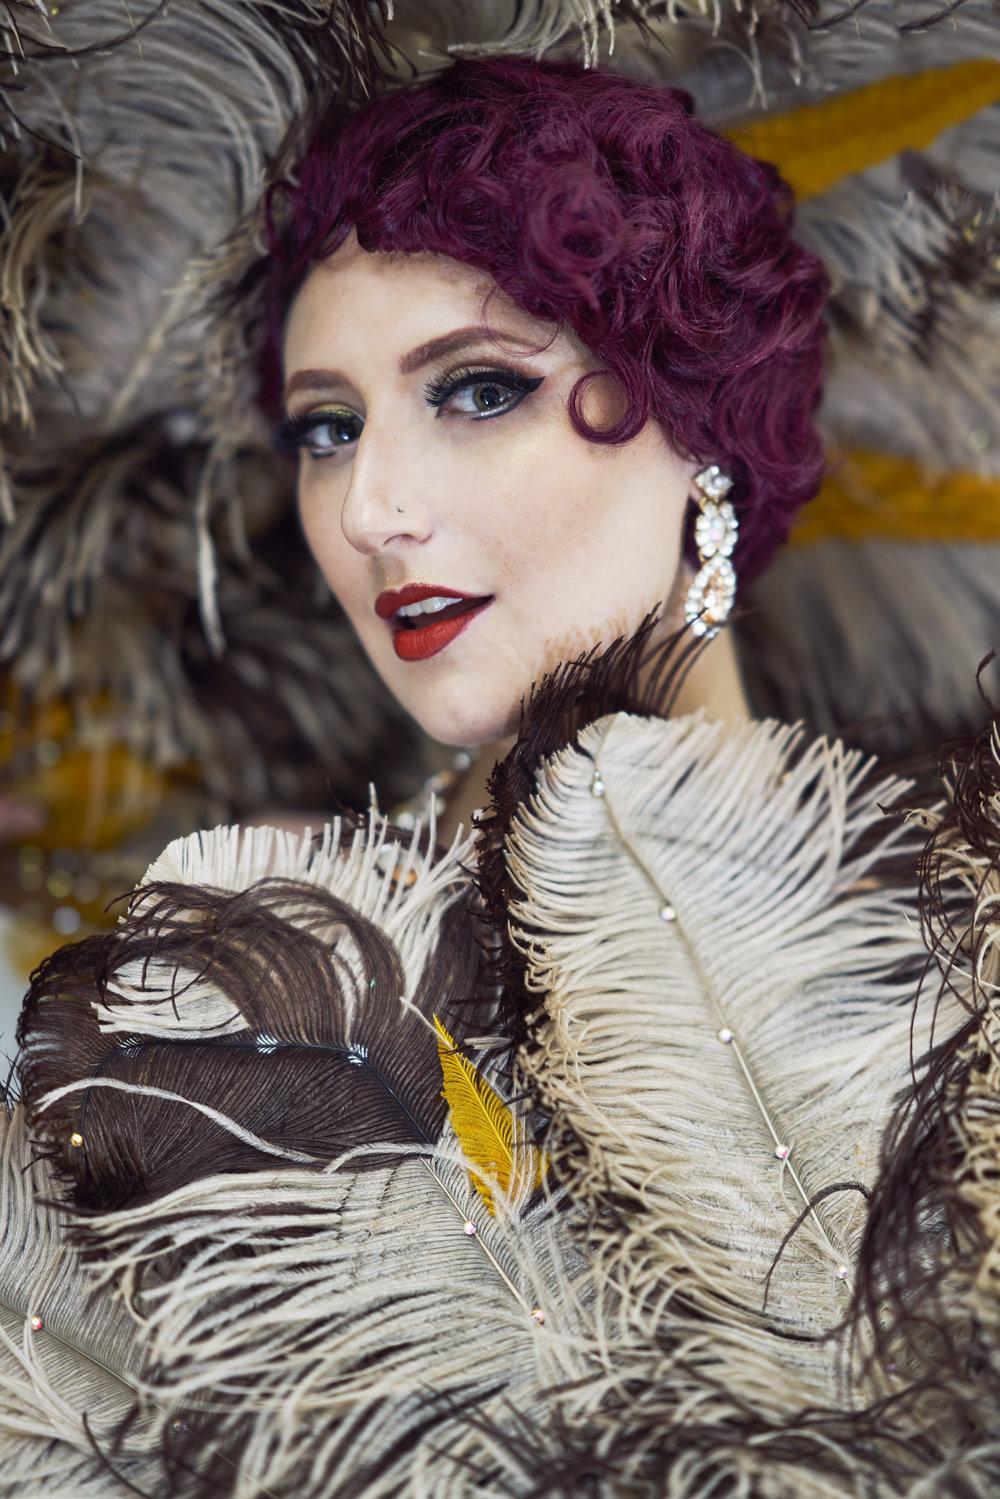 Nina La Voix - 2018